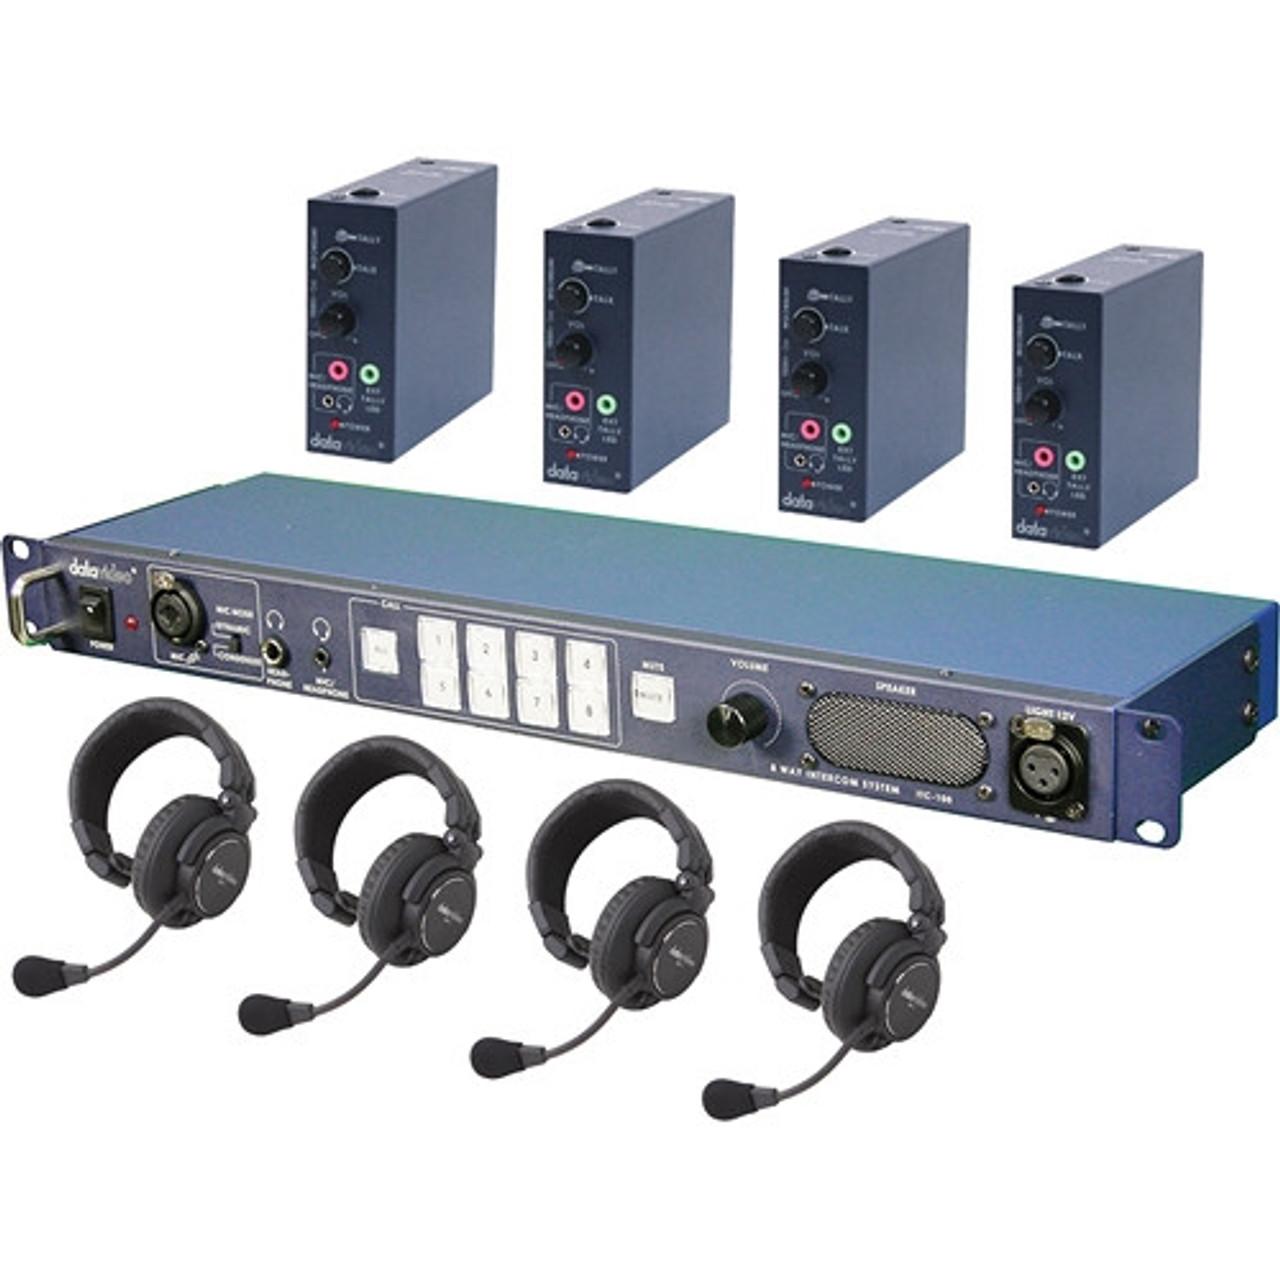 86d79532bcdde9 Datavideo ITC100-HP1K